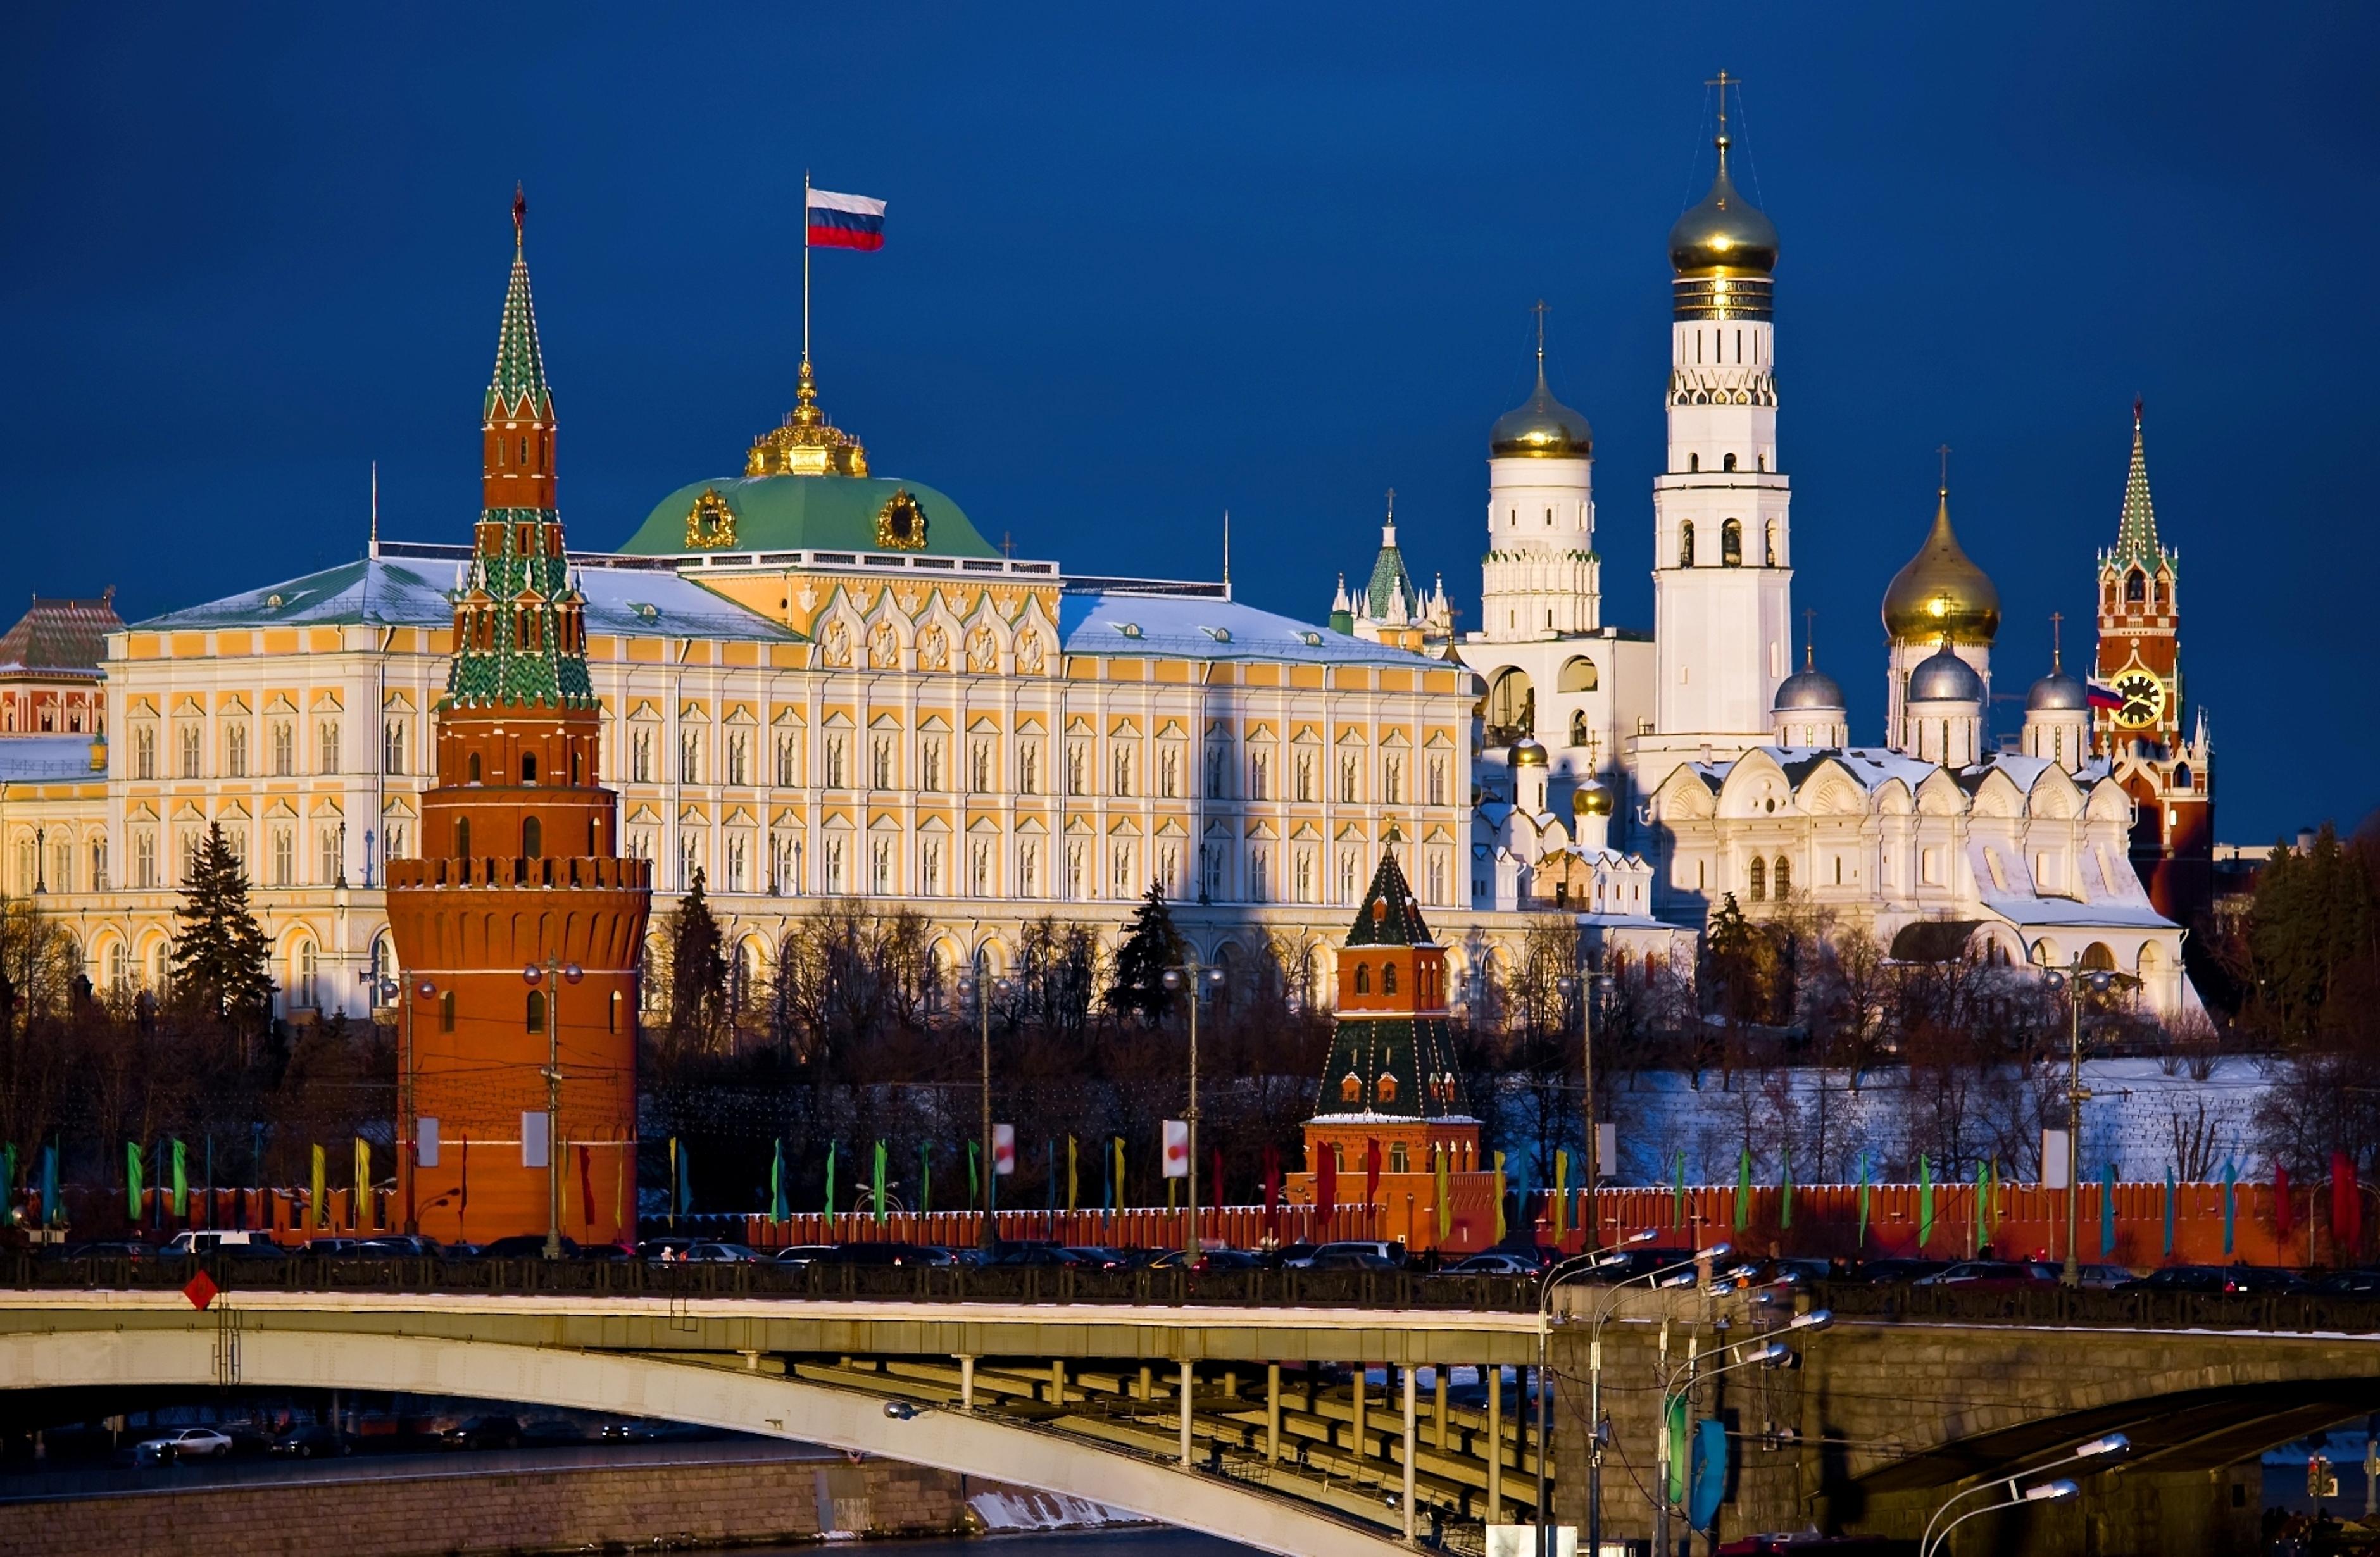 capitale-de-russie - Photo